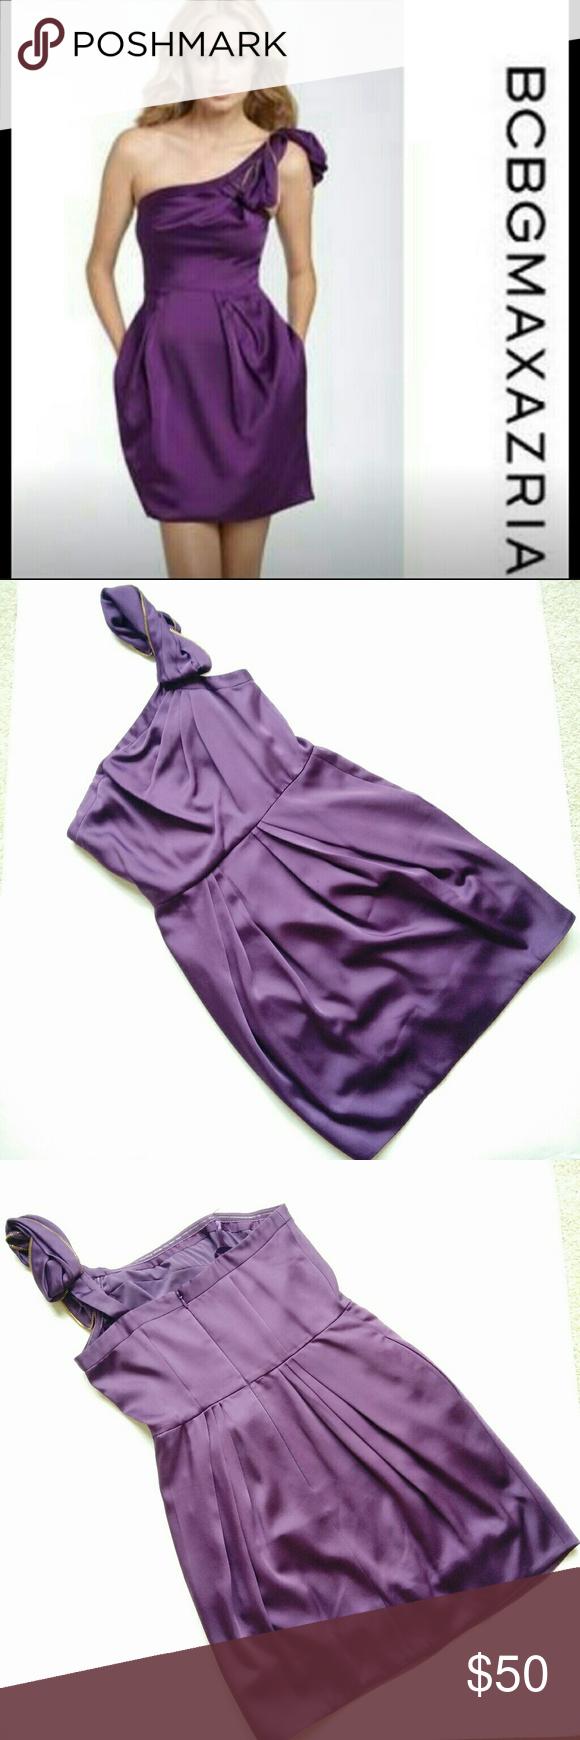 BCBG MAXAZRIA] cocktail one shoulder pocket dress